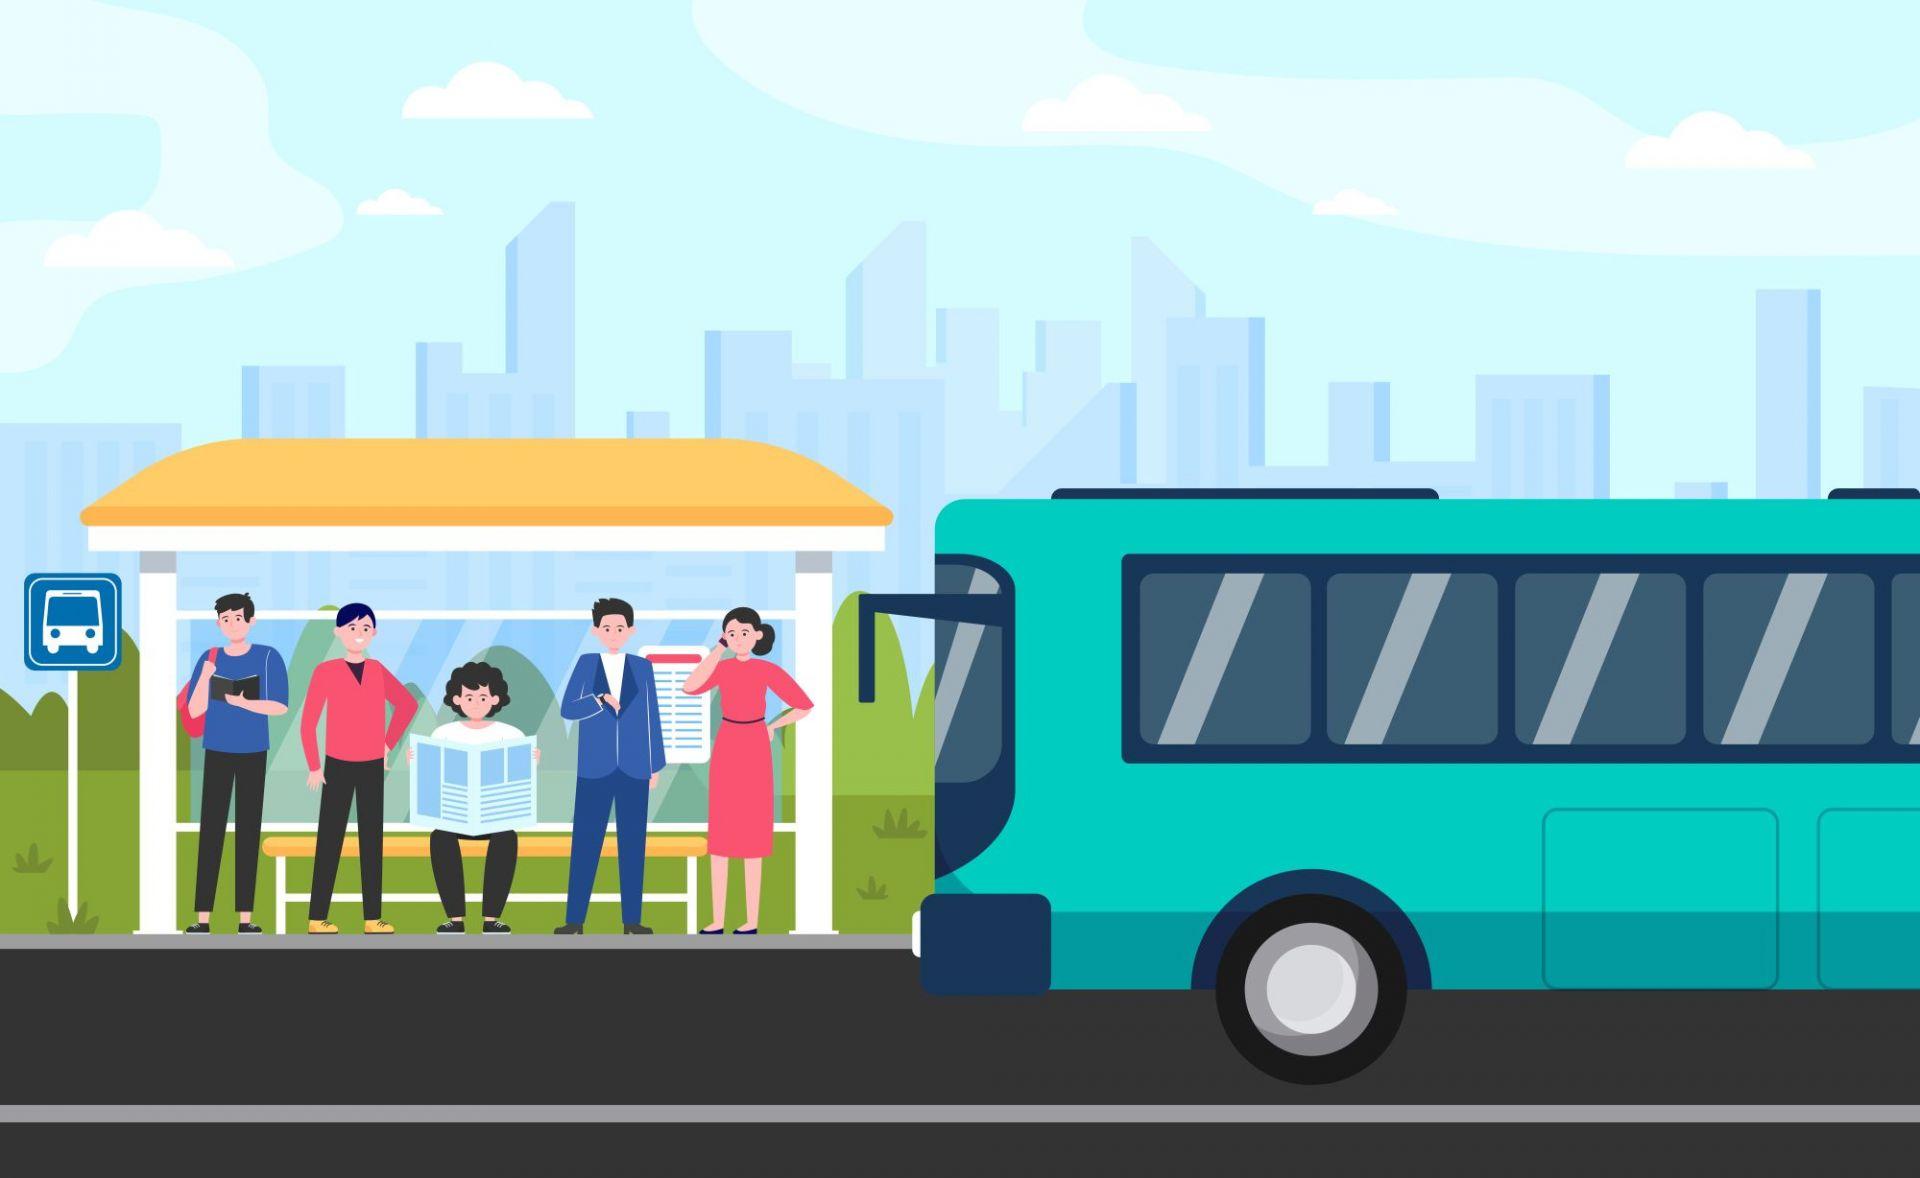 Nová tarifa v prímestských autobusoch ŽSK